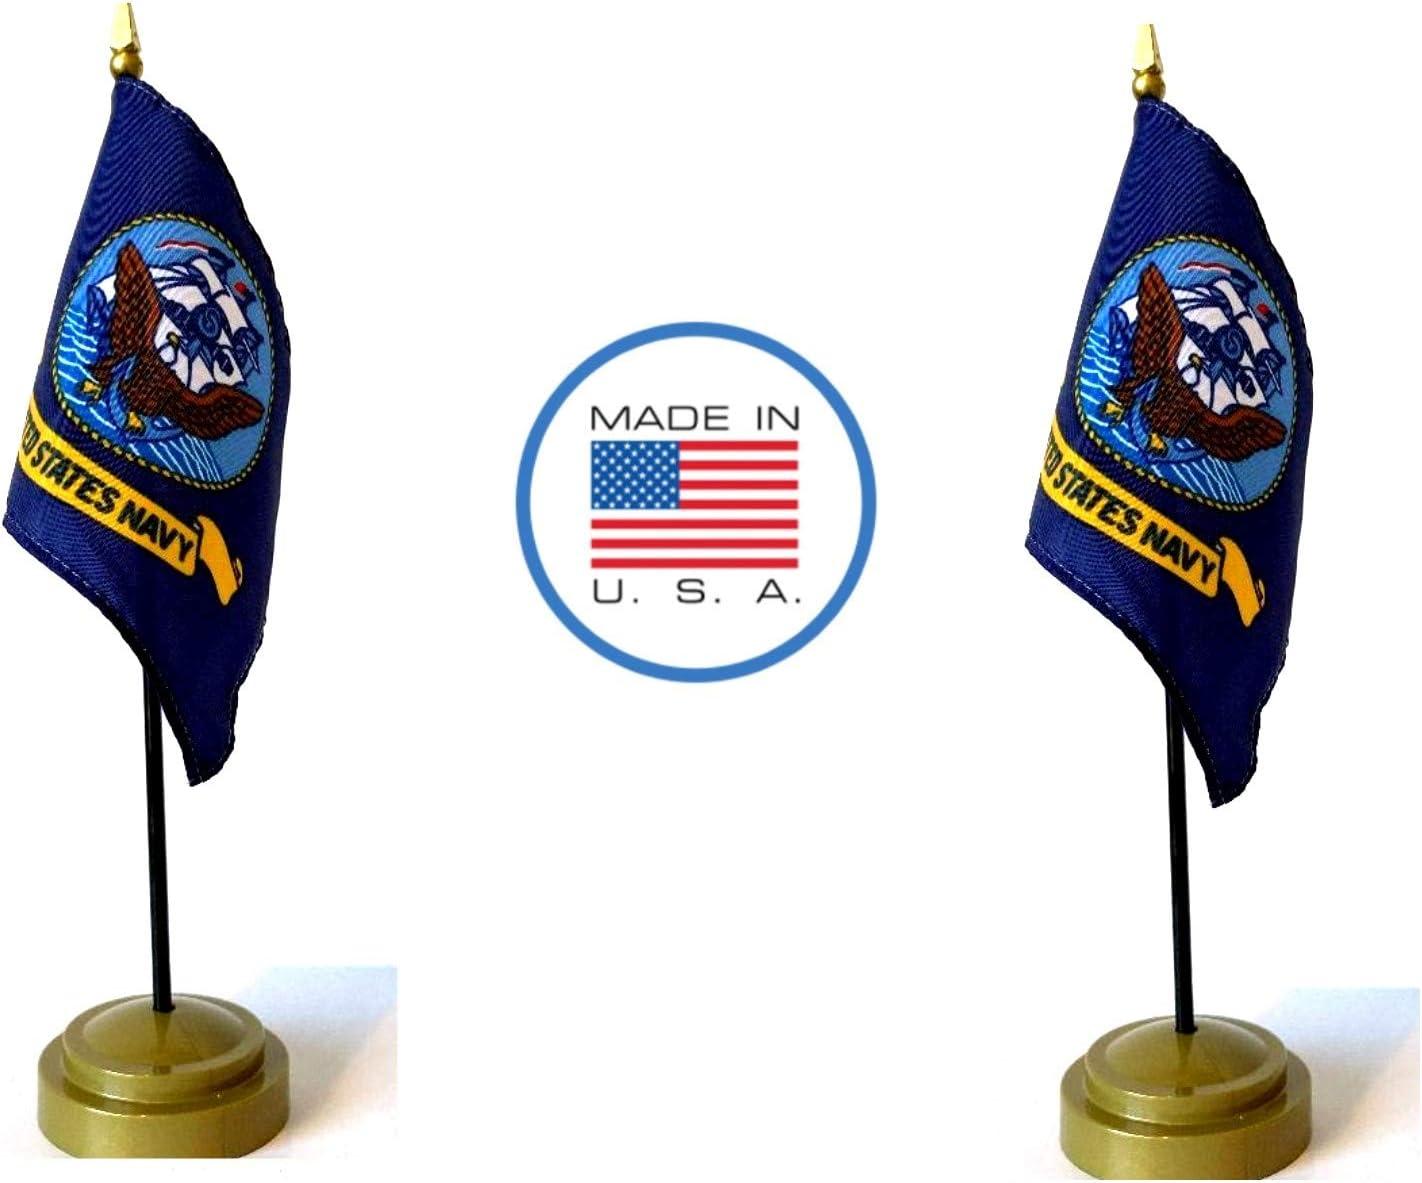 United States Navy USN Small Hand Waving Flag